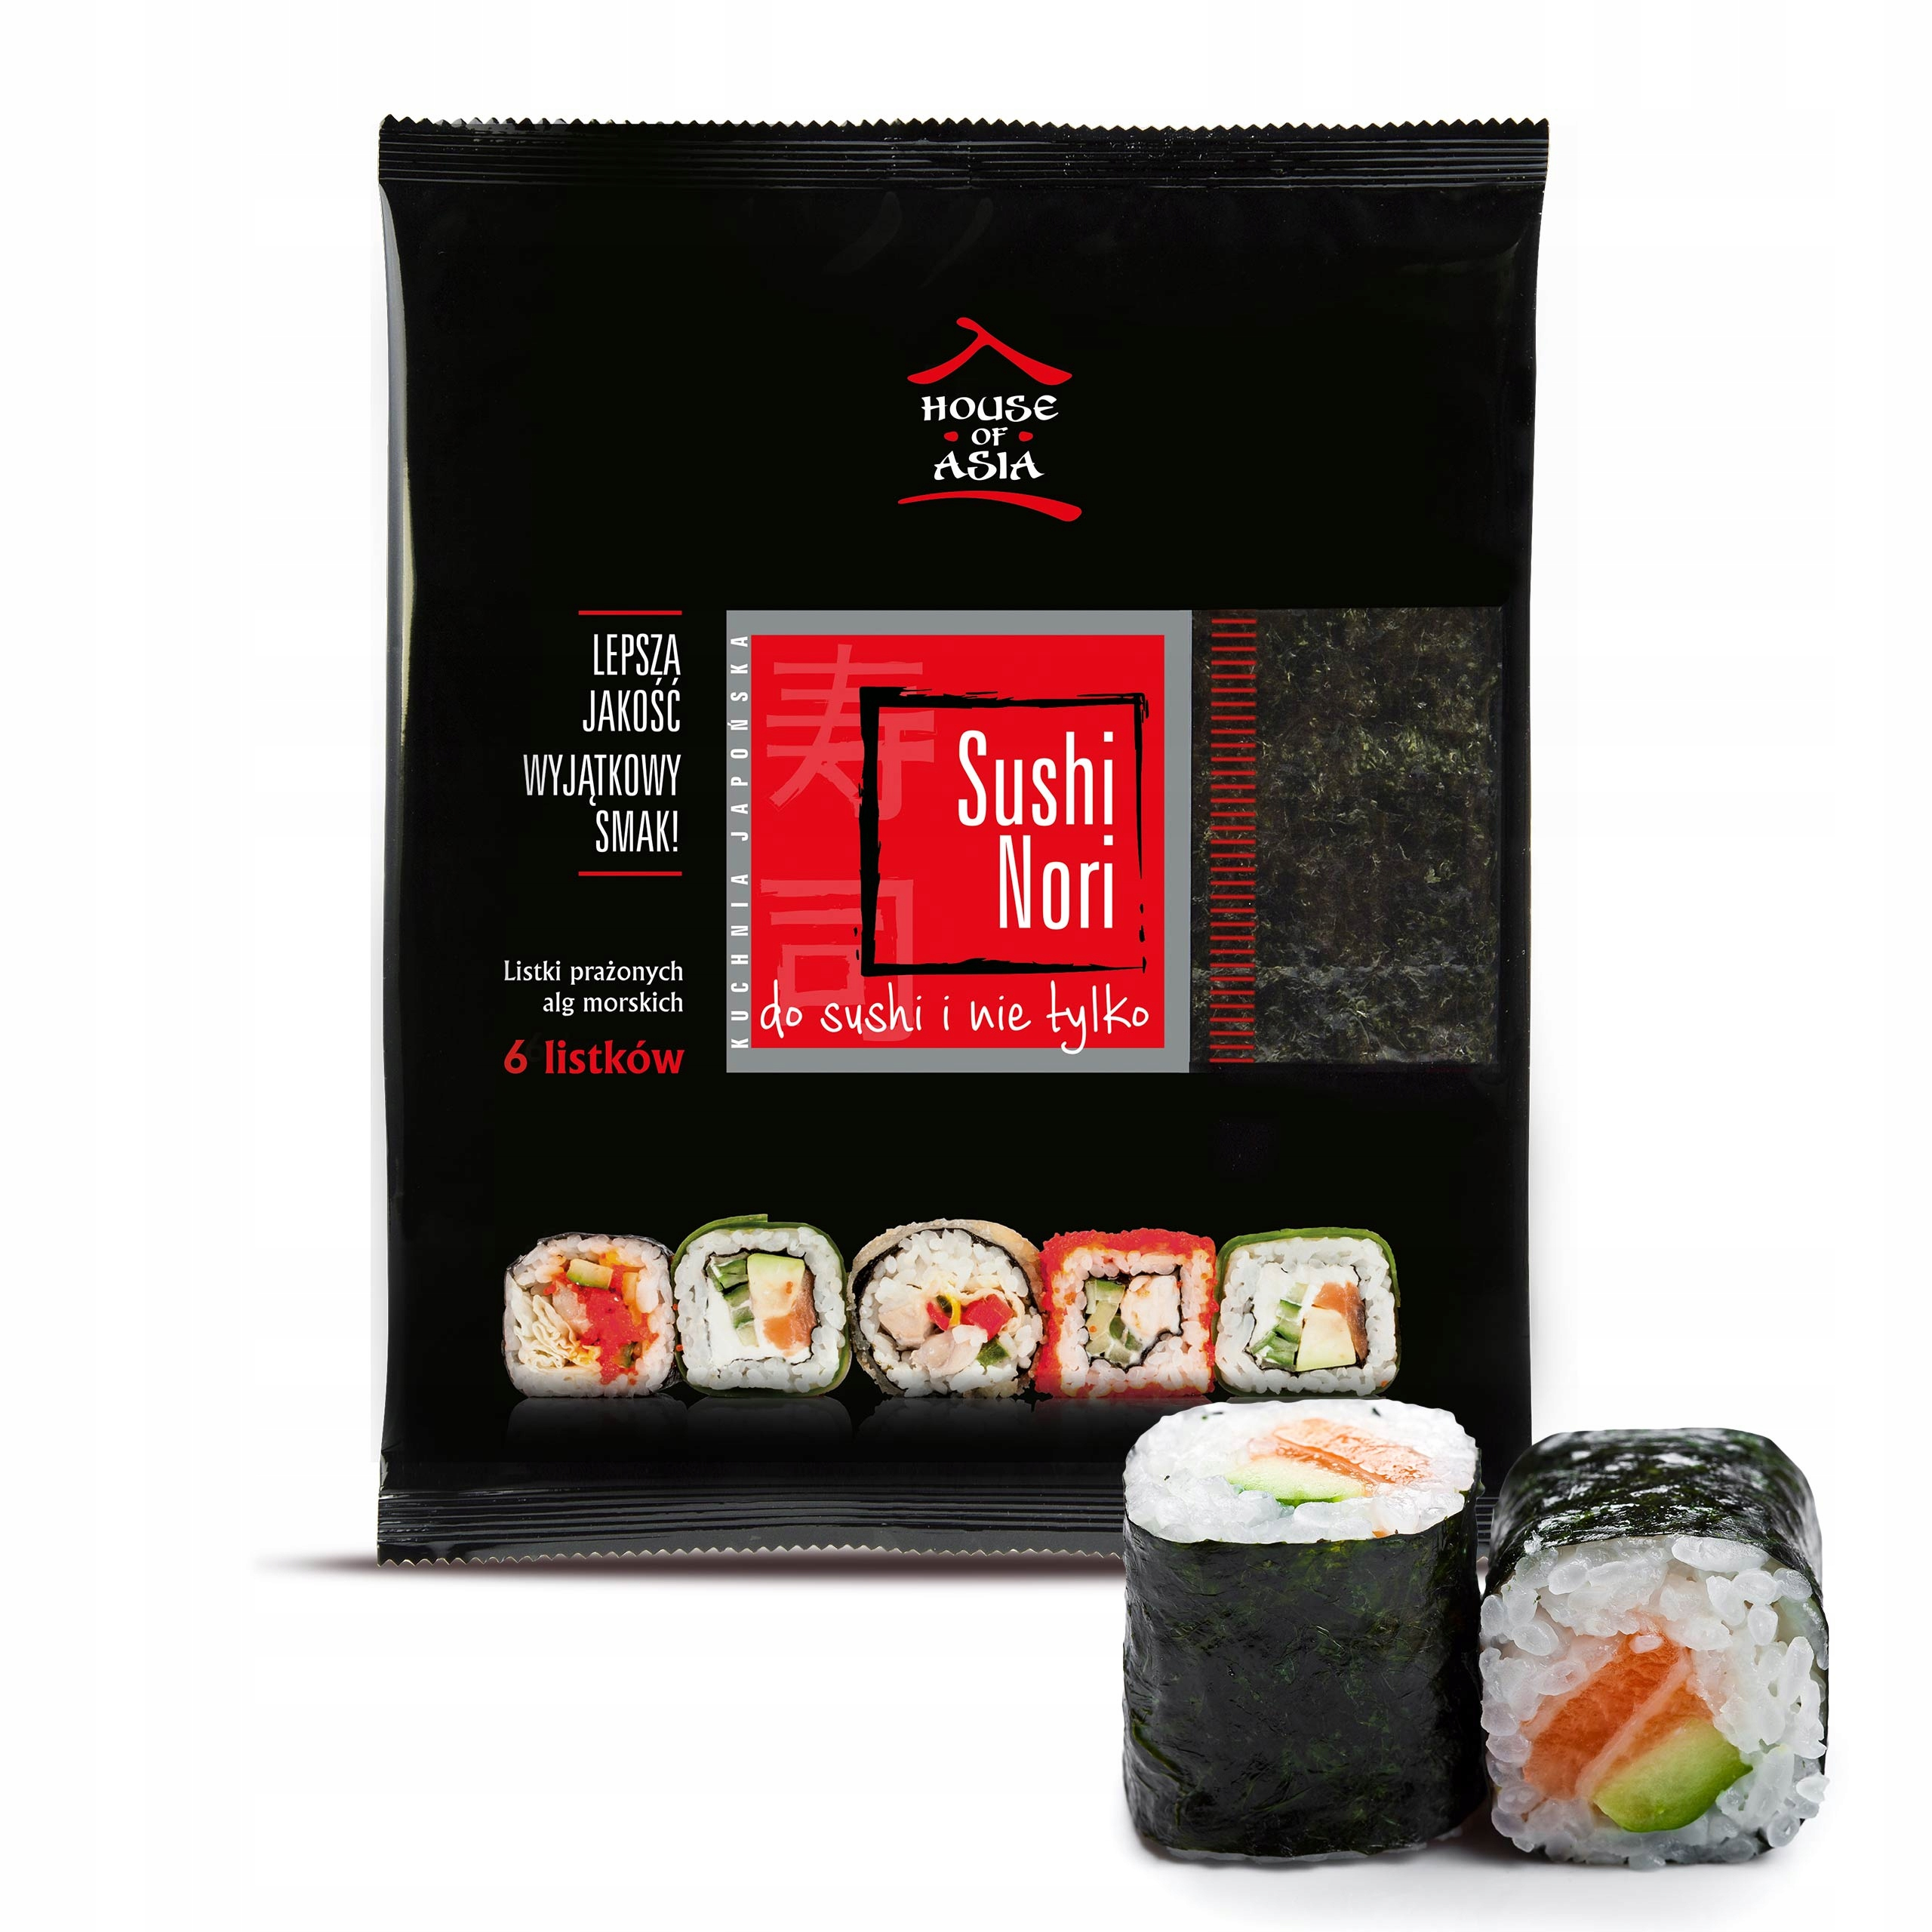 Sushi Nori Liście alg morskich 6 sztuk 15 g